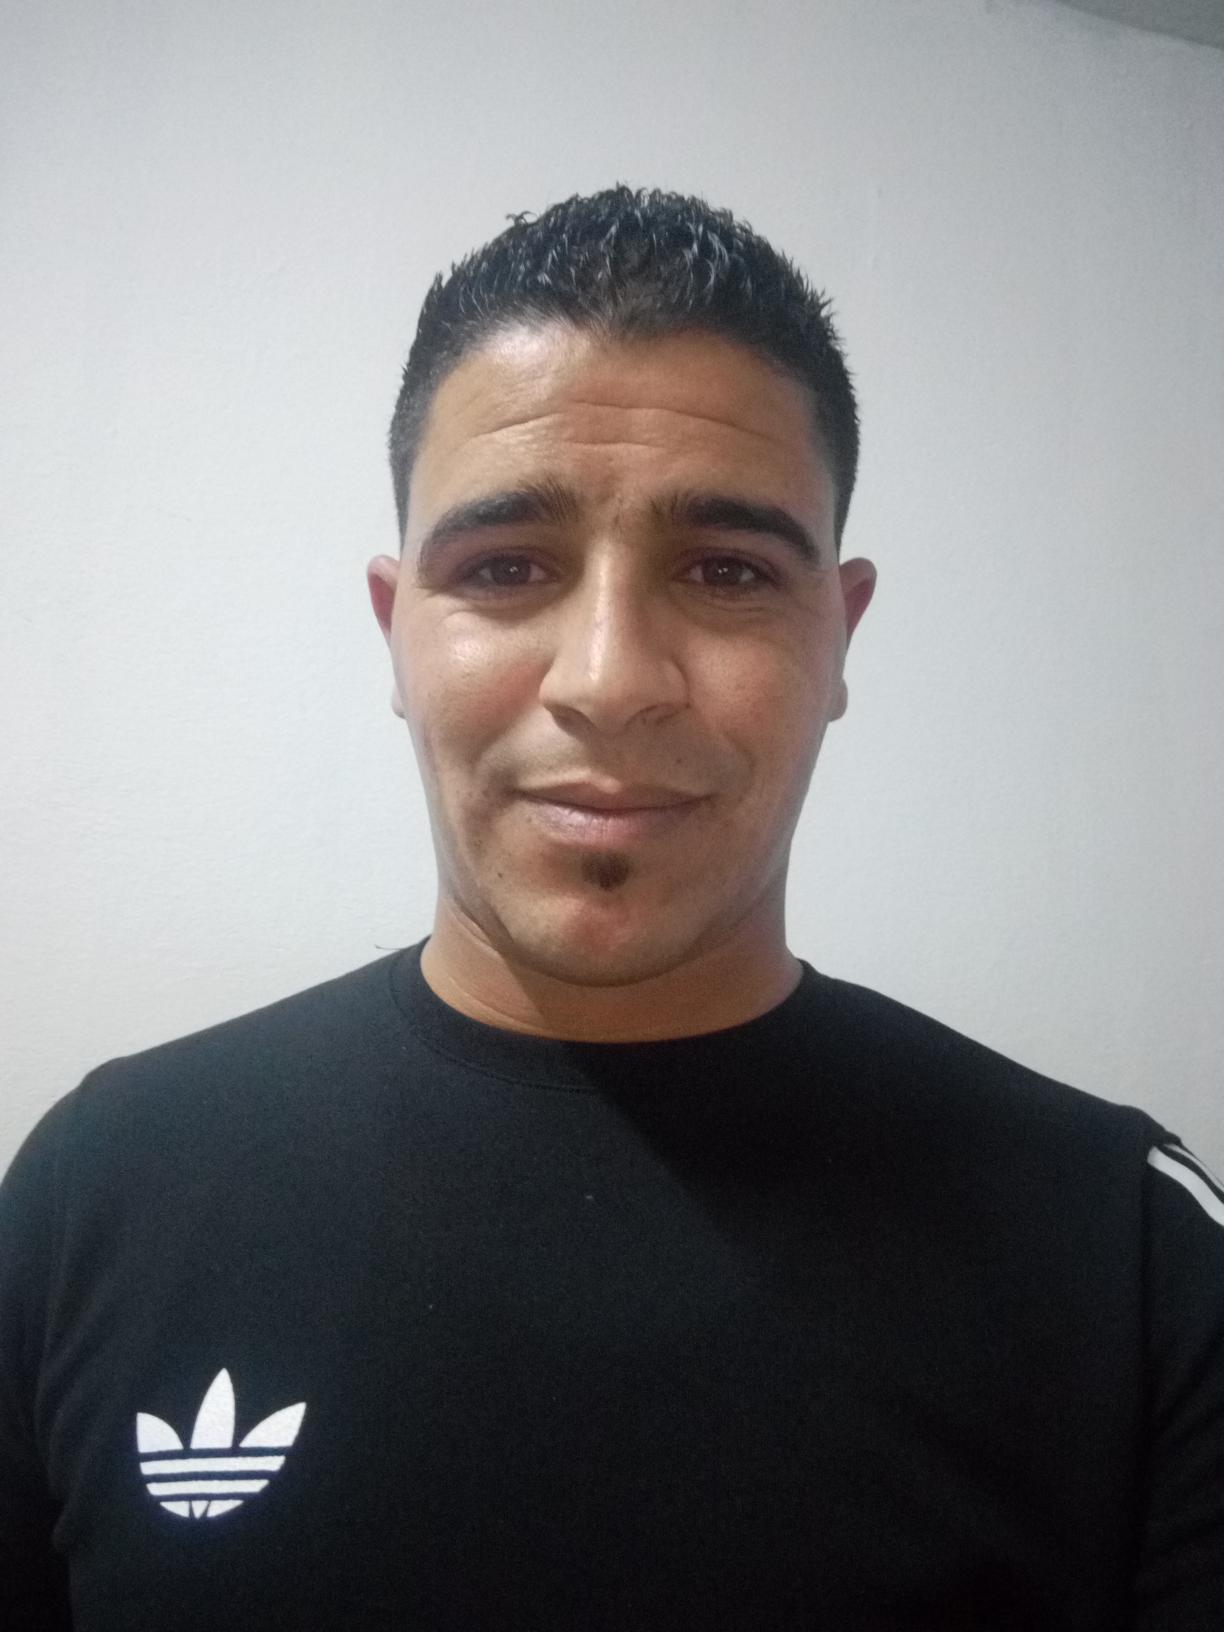 Ramzi Rouabeh